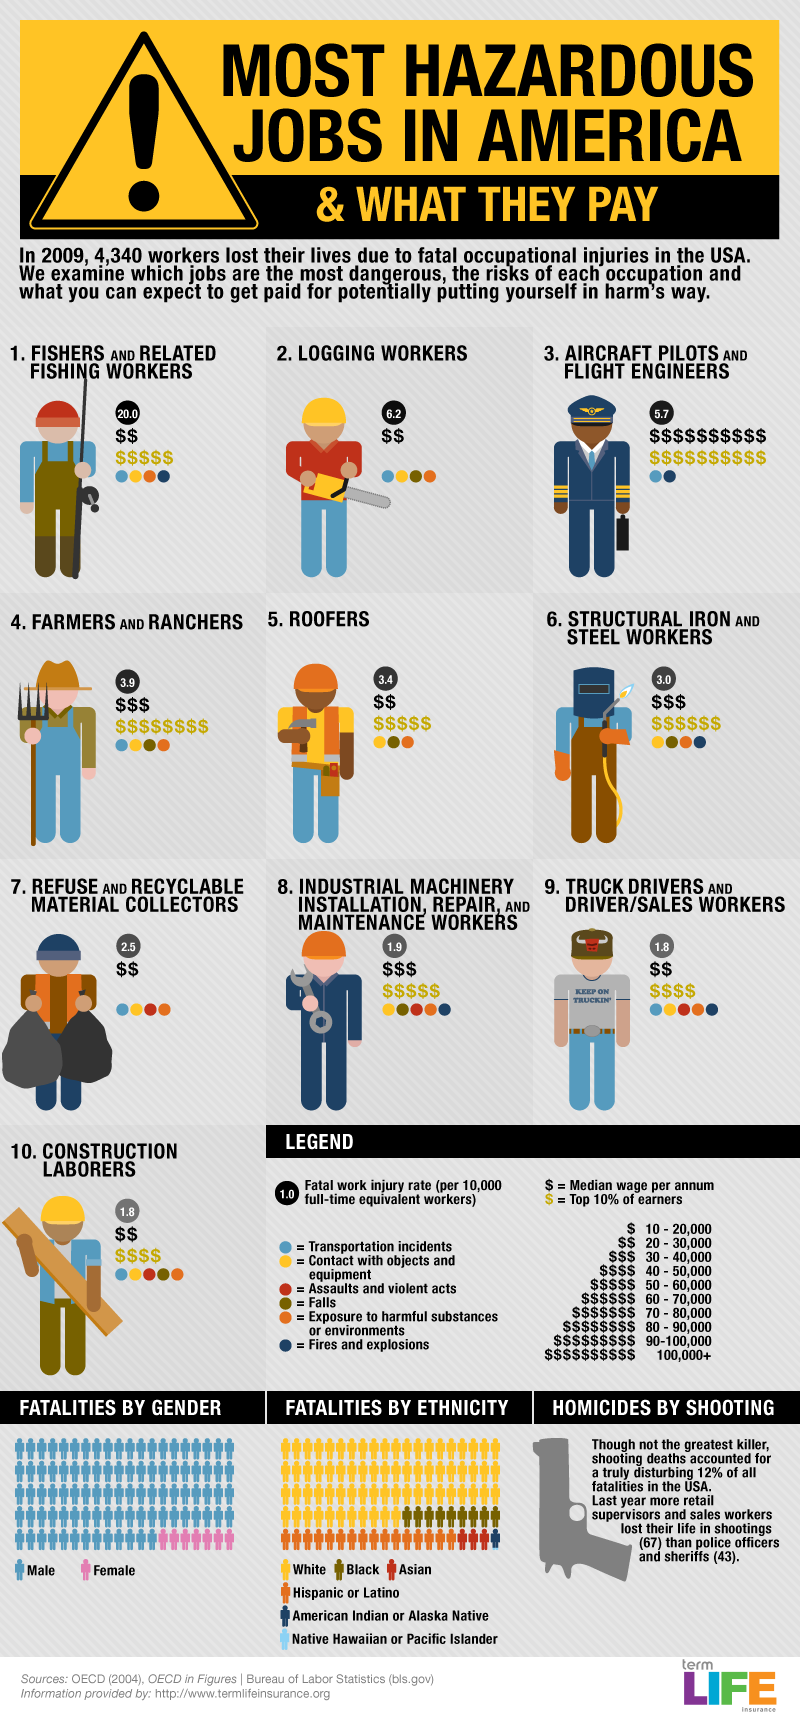 Pin By Nicola Ziady On Find A Job In 2012 Dangerous Jobs Health